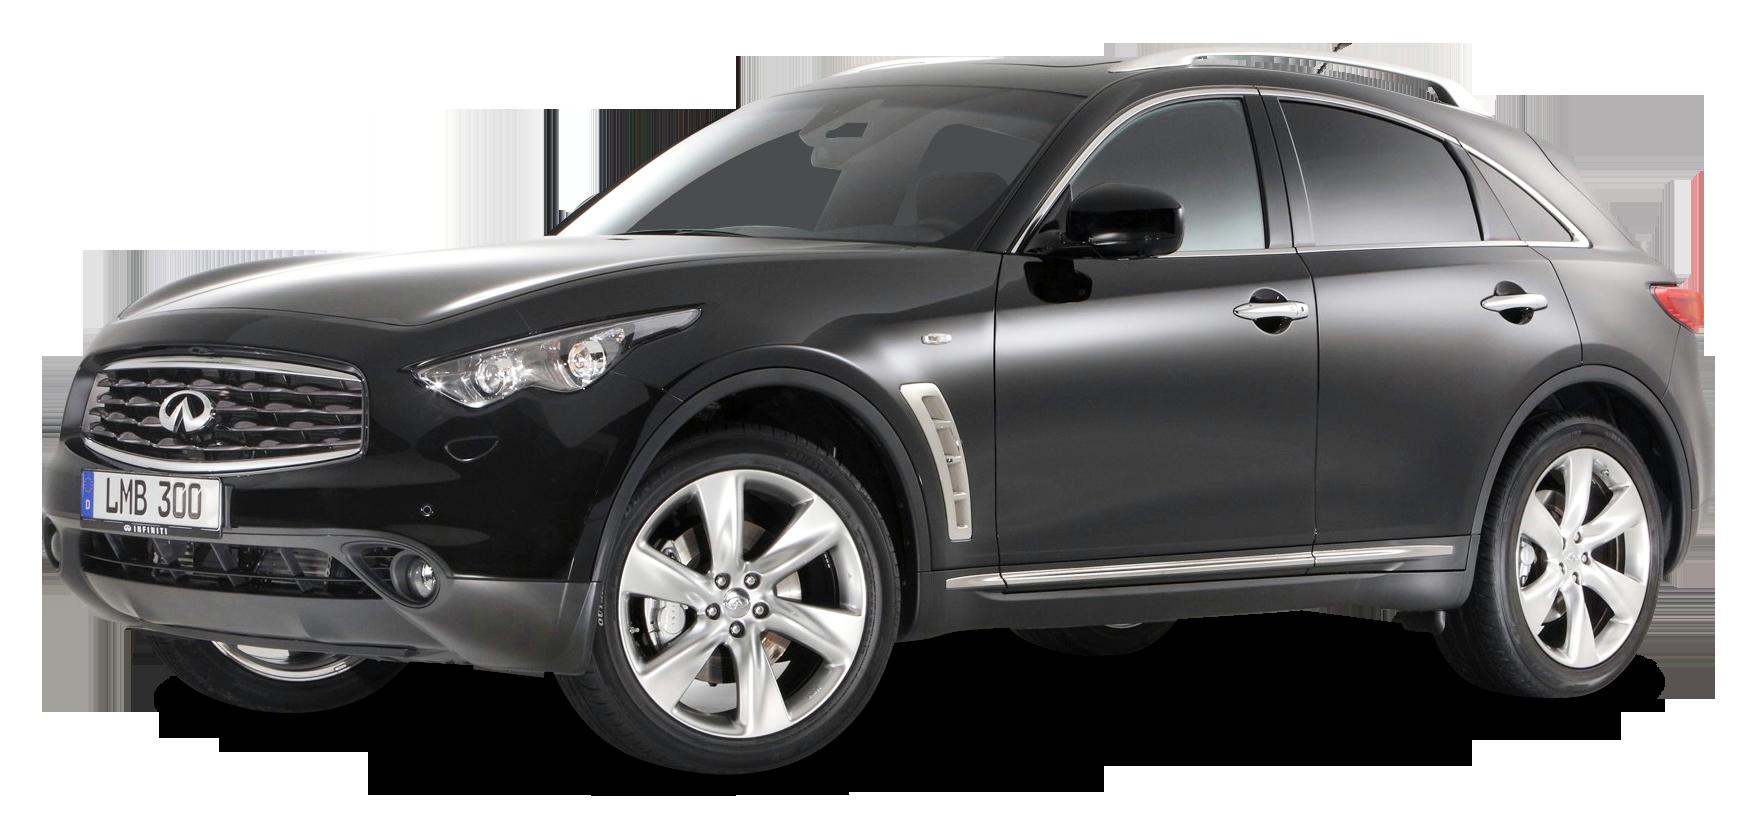 Infiniti Fx30d S Black Car Png Image Black Car Car Infinity Suv